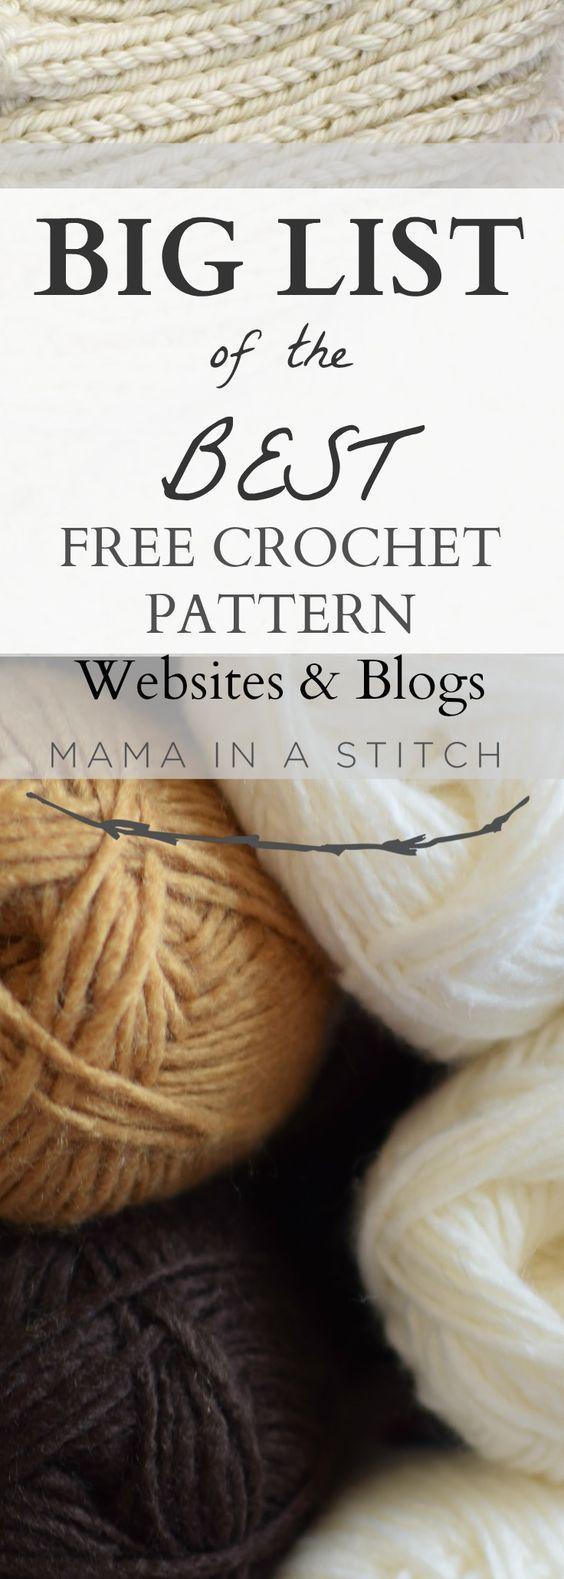 Pin de Billie Otero en crochet patterns | Pinterest | Ganchillo ...